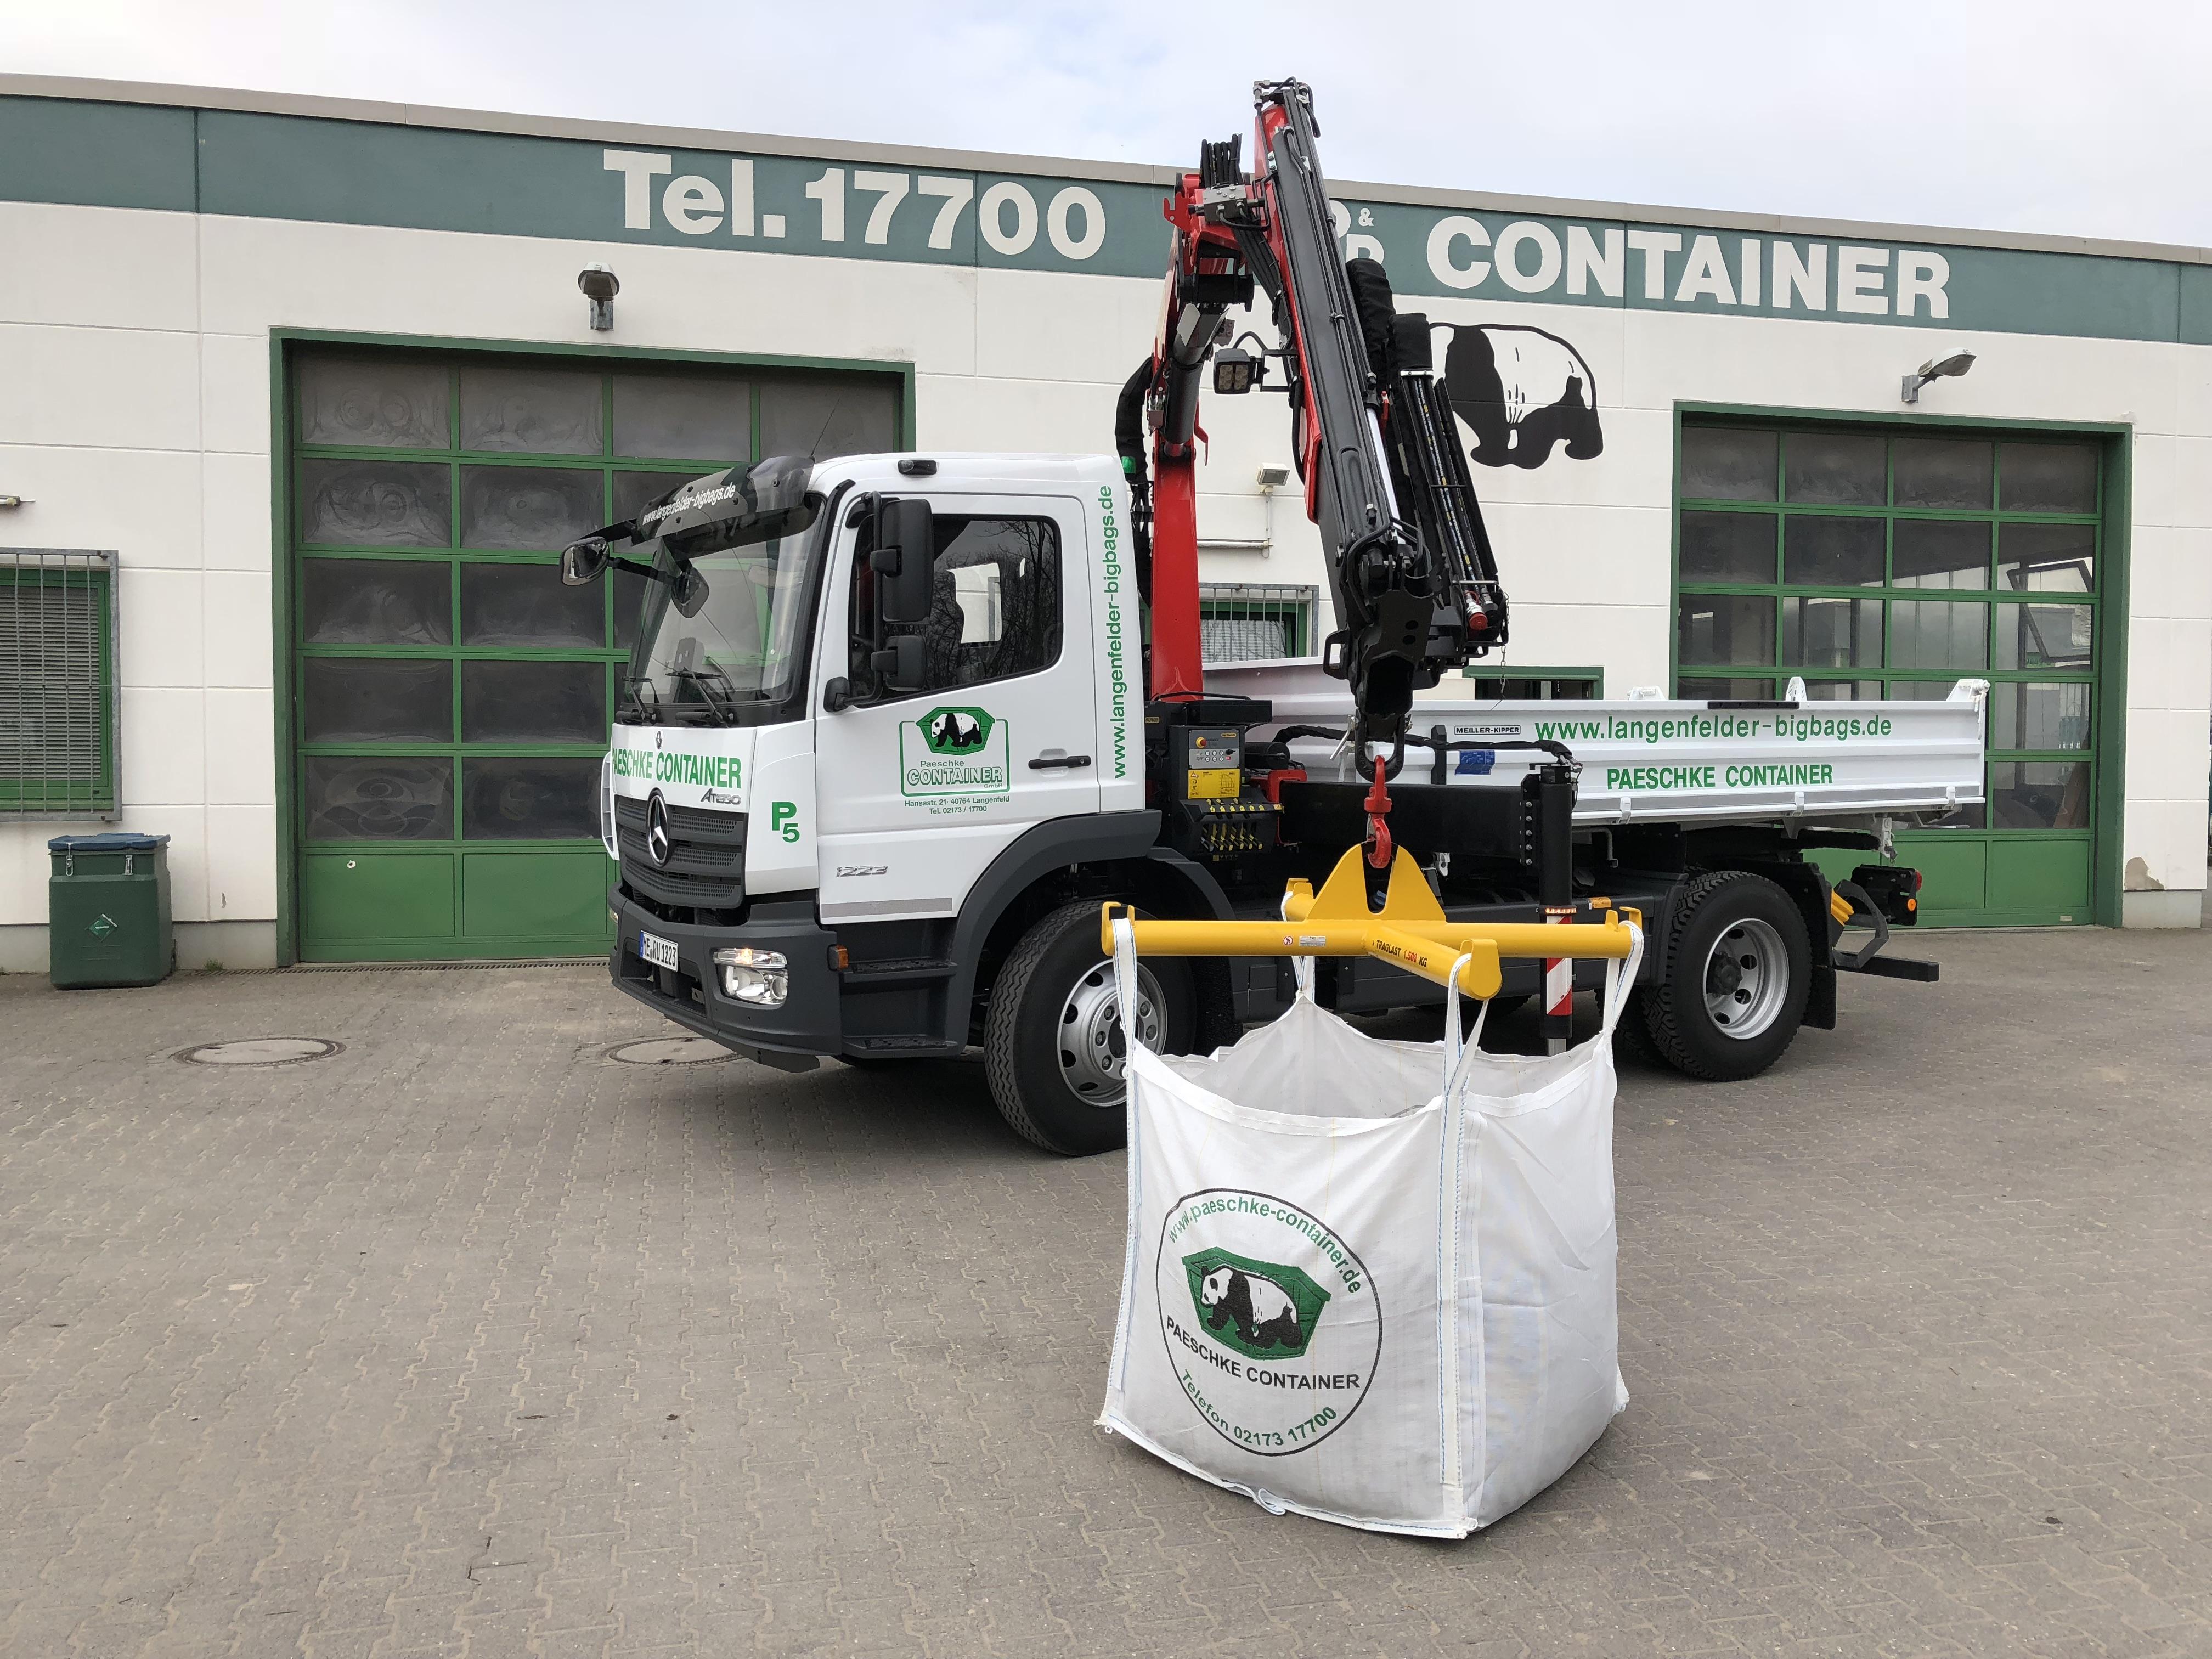 Paeschke Container GmbH